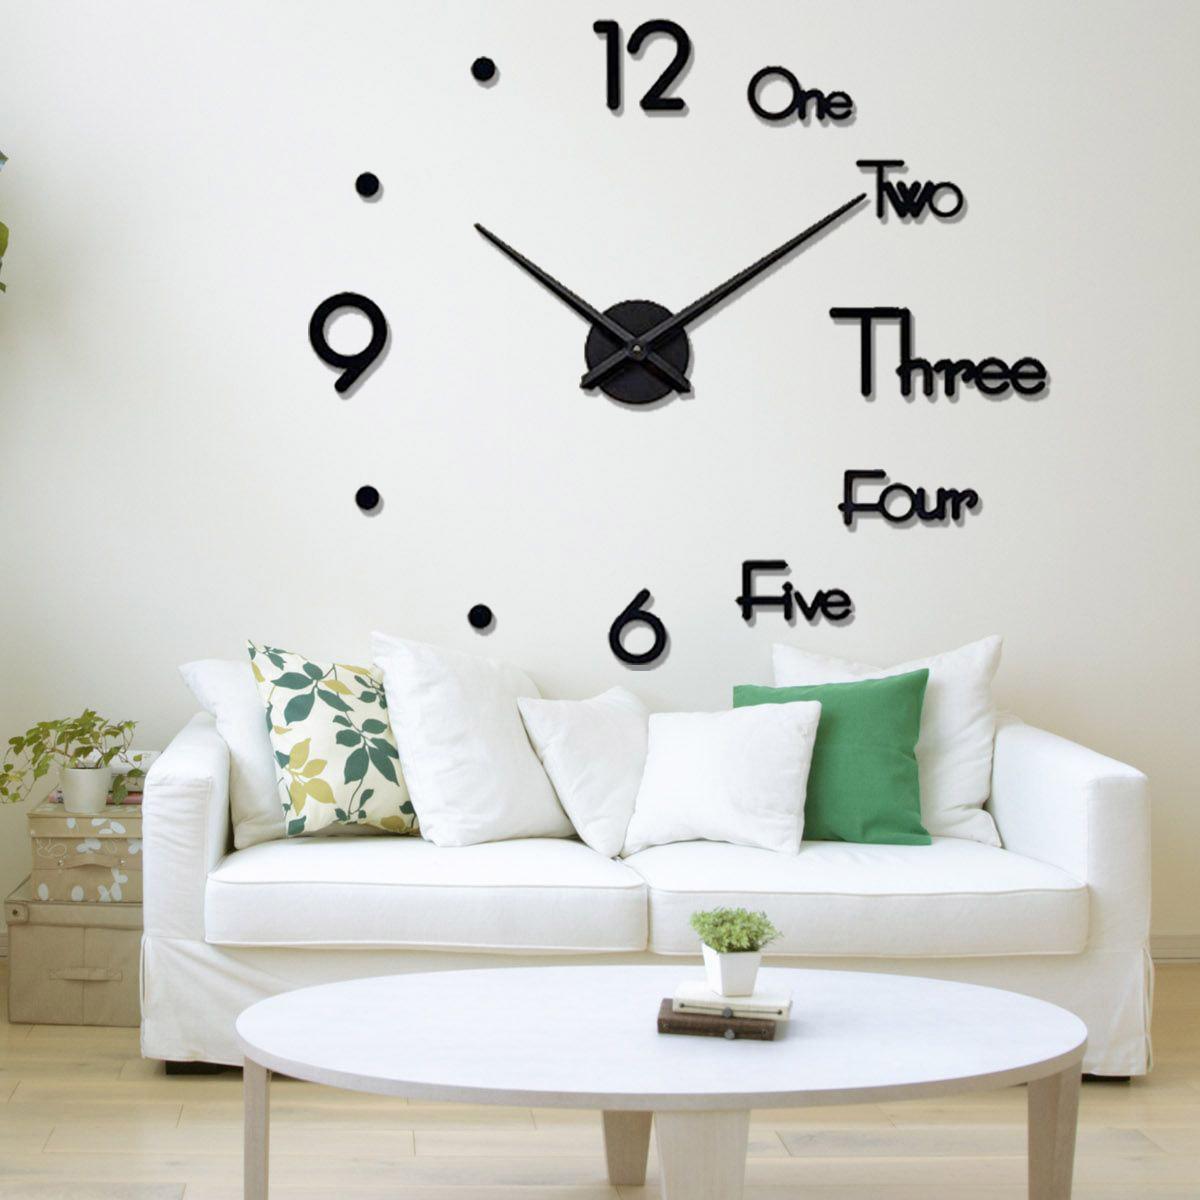 2021 New 3D Wall Clocks New Fashion Wood Clock For Living Room Quartz Watch DIY Home Decoration Clocks Matti Closures And Matti Design